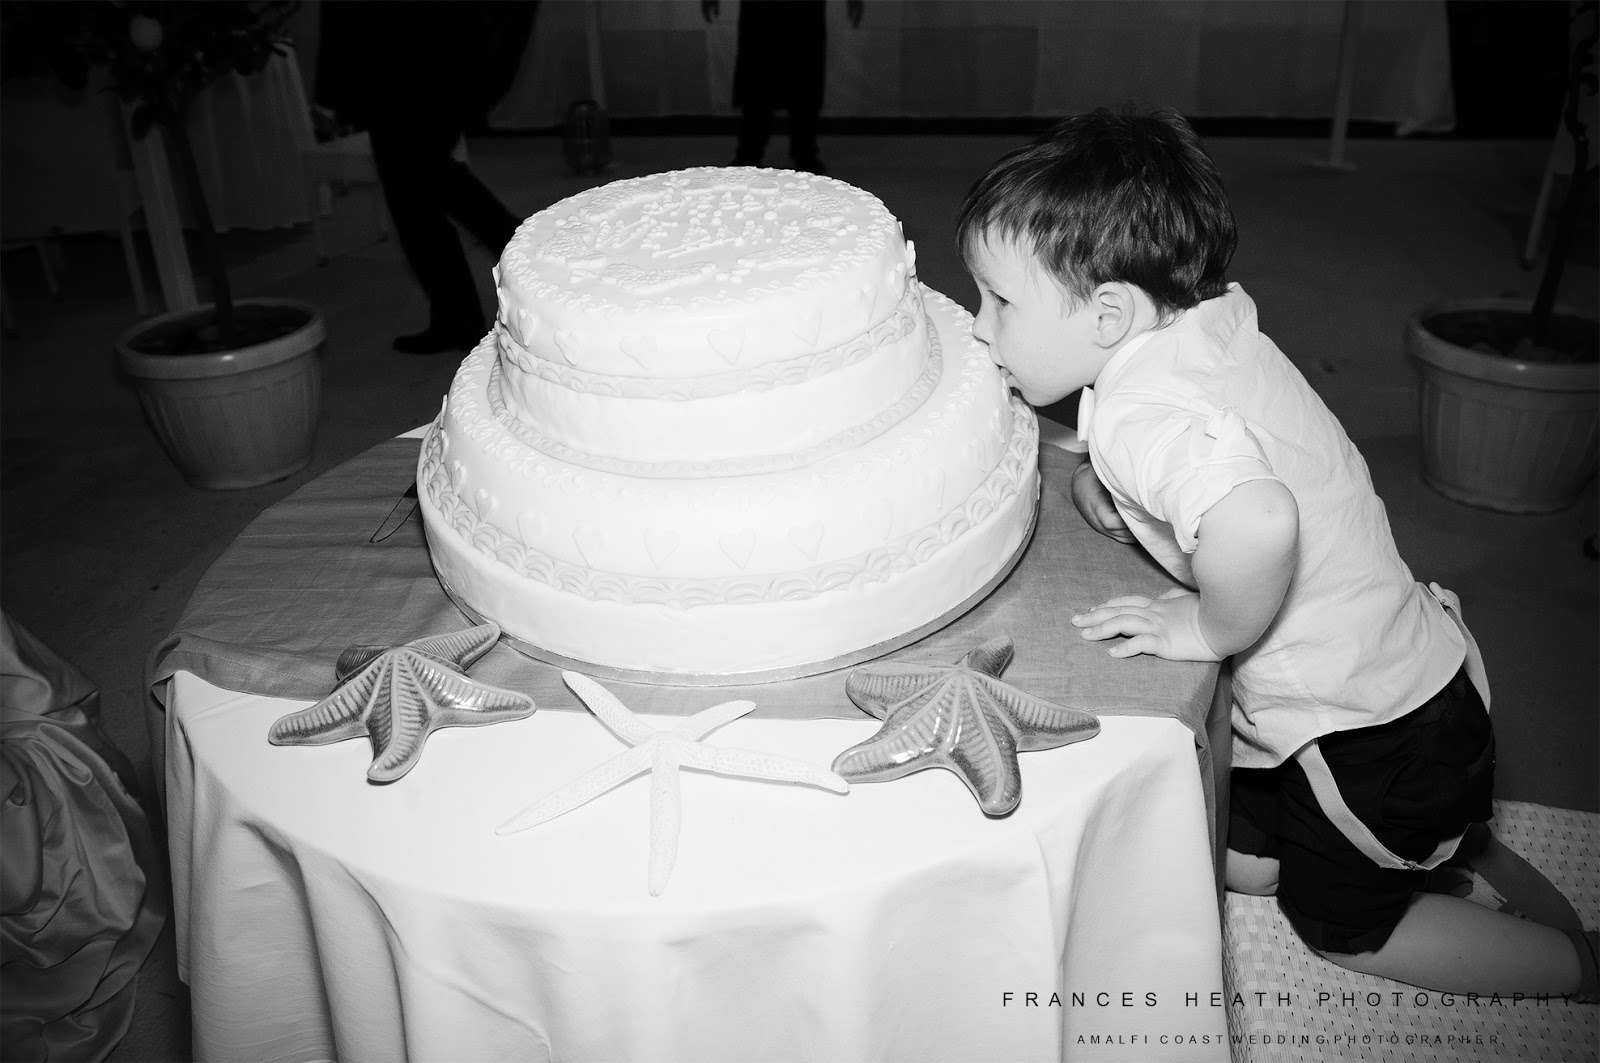 Wedding cake at the Sassi Beach Club in Nerano